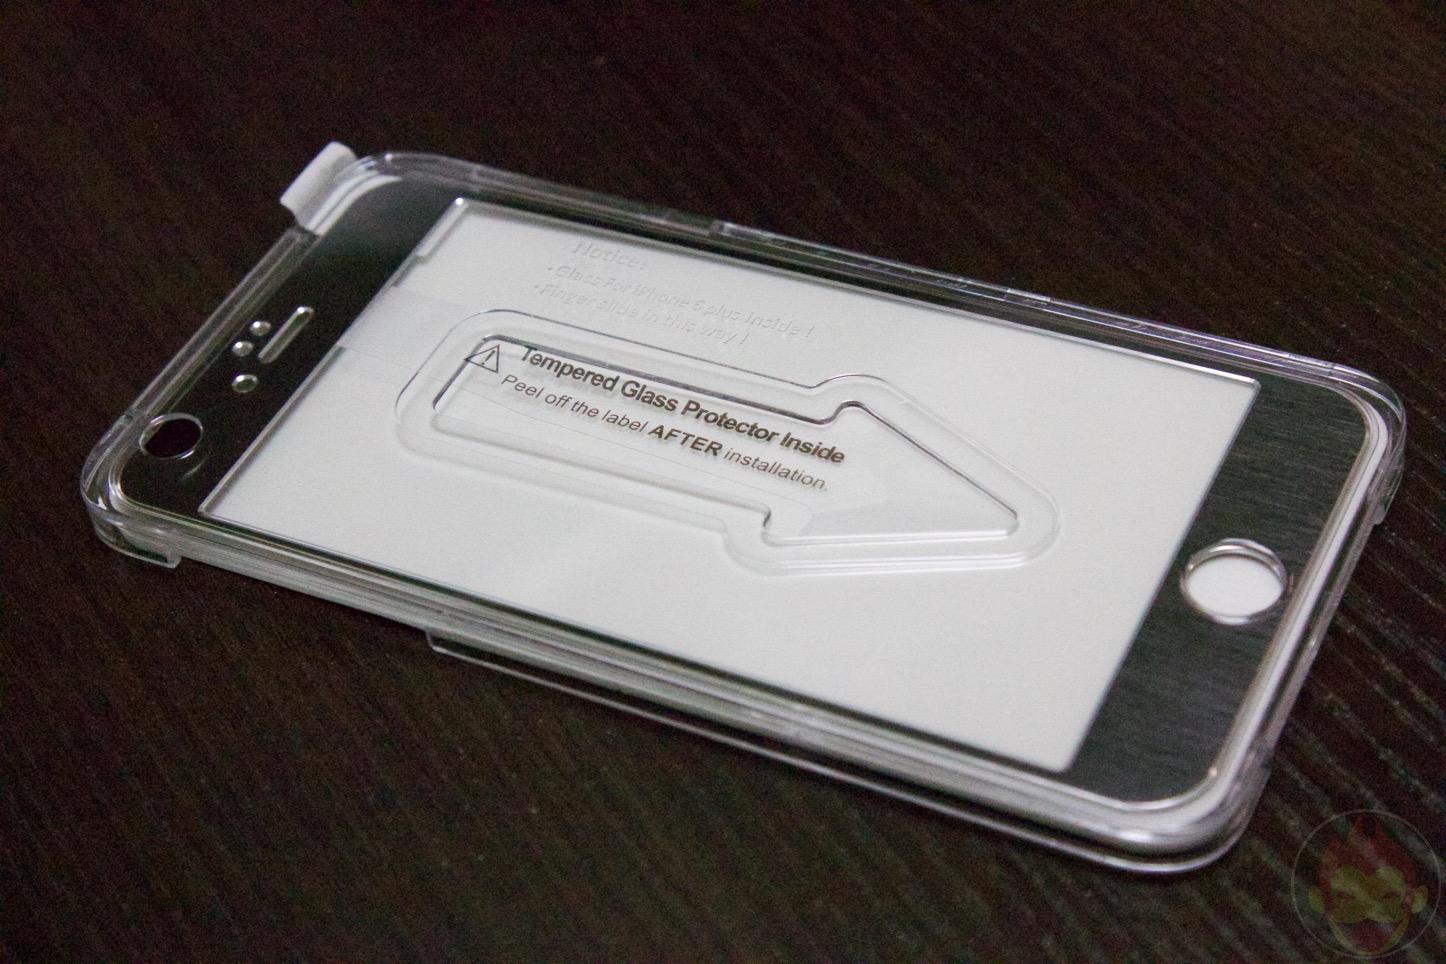 REAL SHIELD 硬度9H 液晶保護ガラス 全面フルカバー 業界初特殊メタル加工